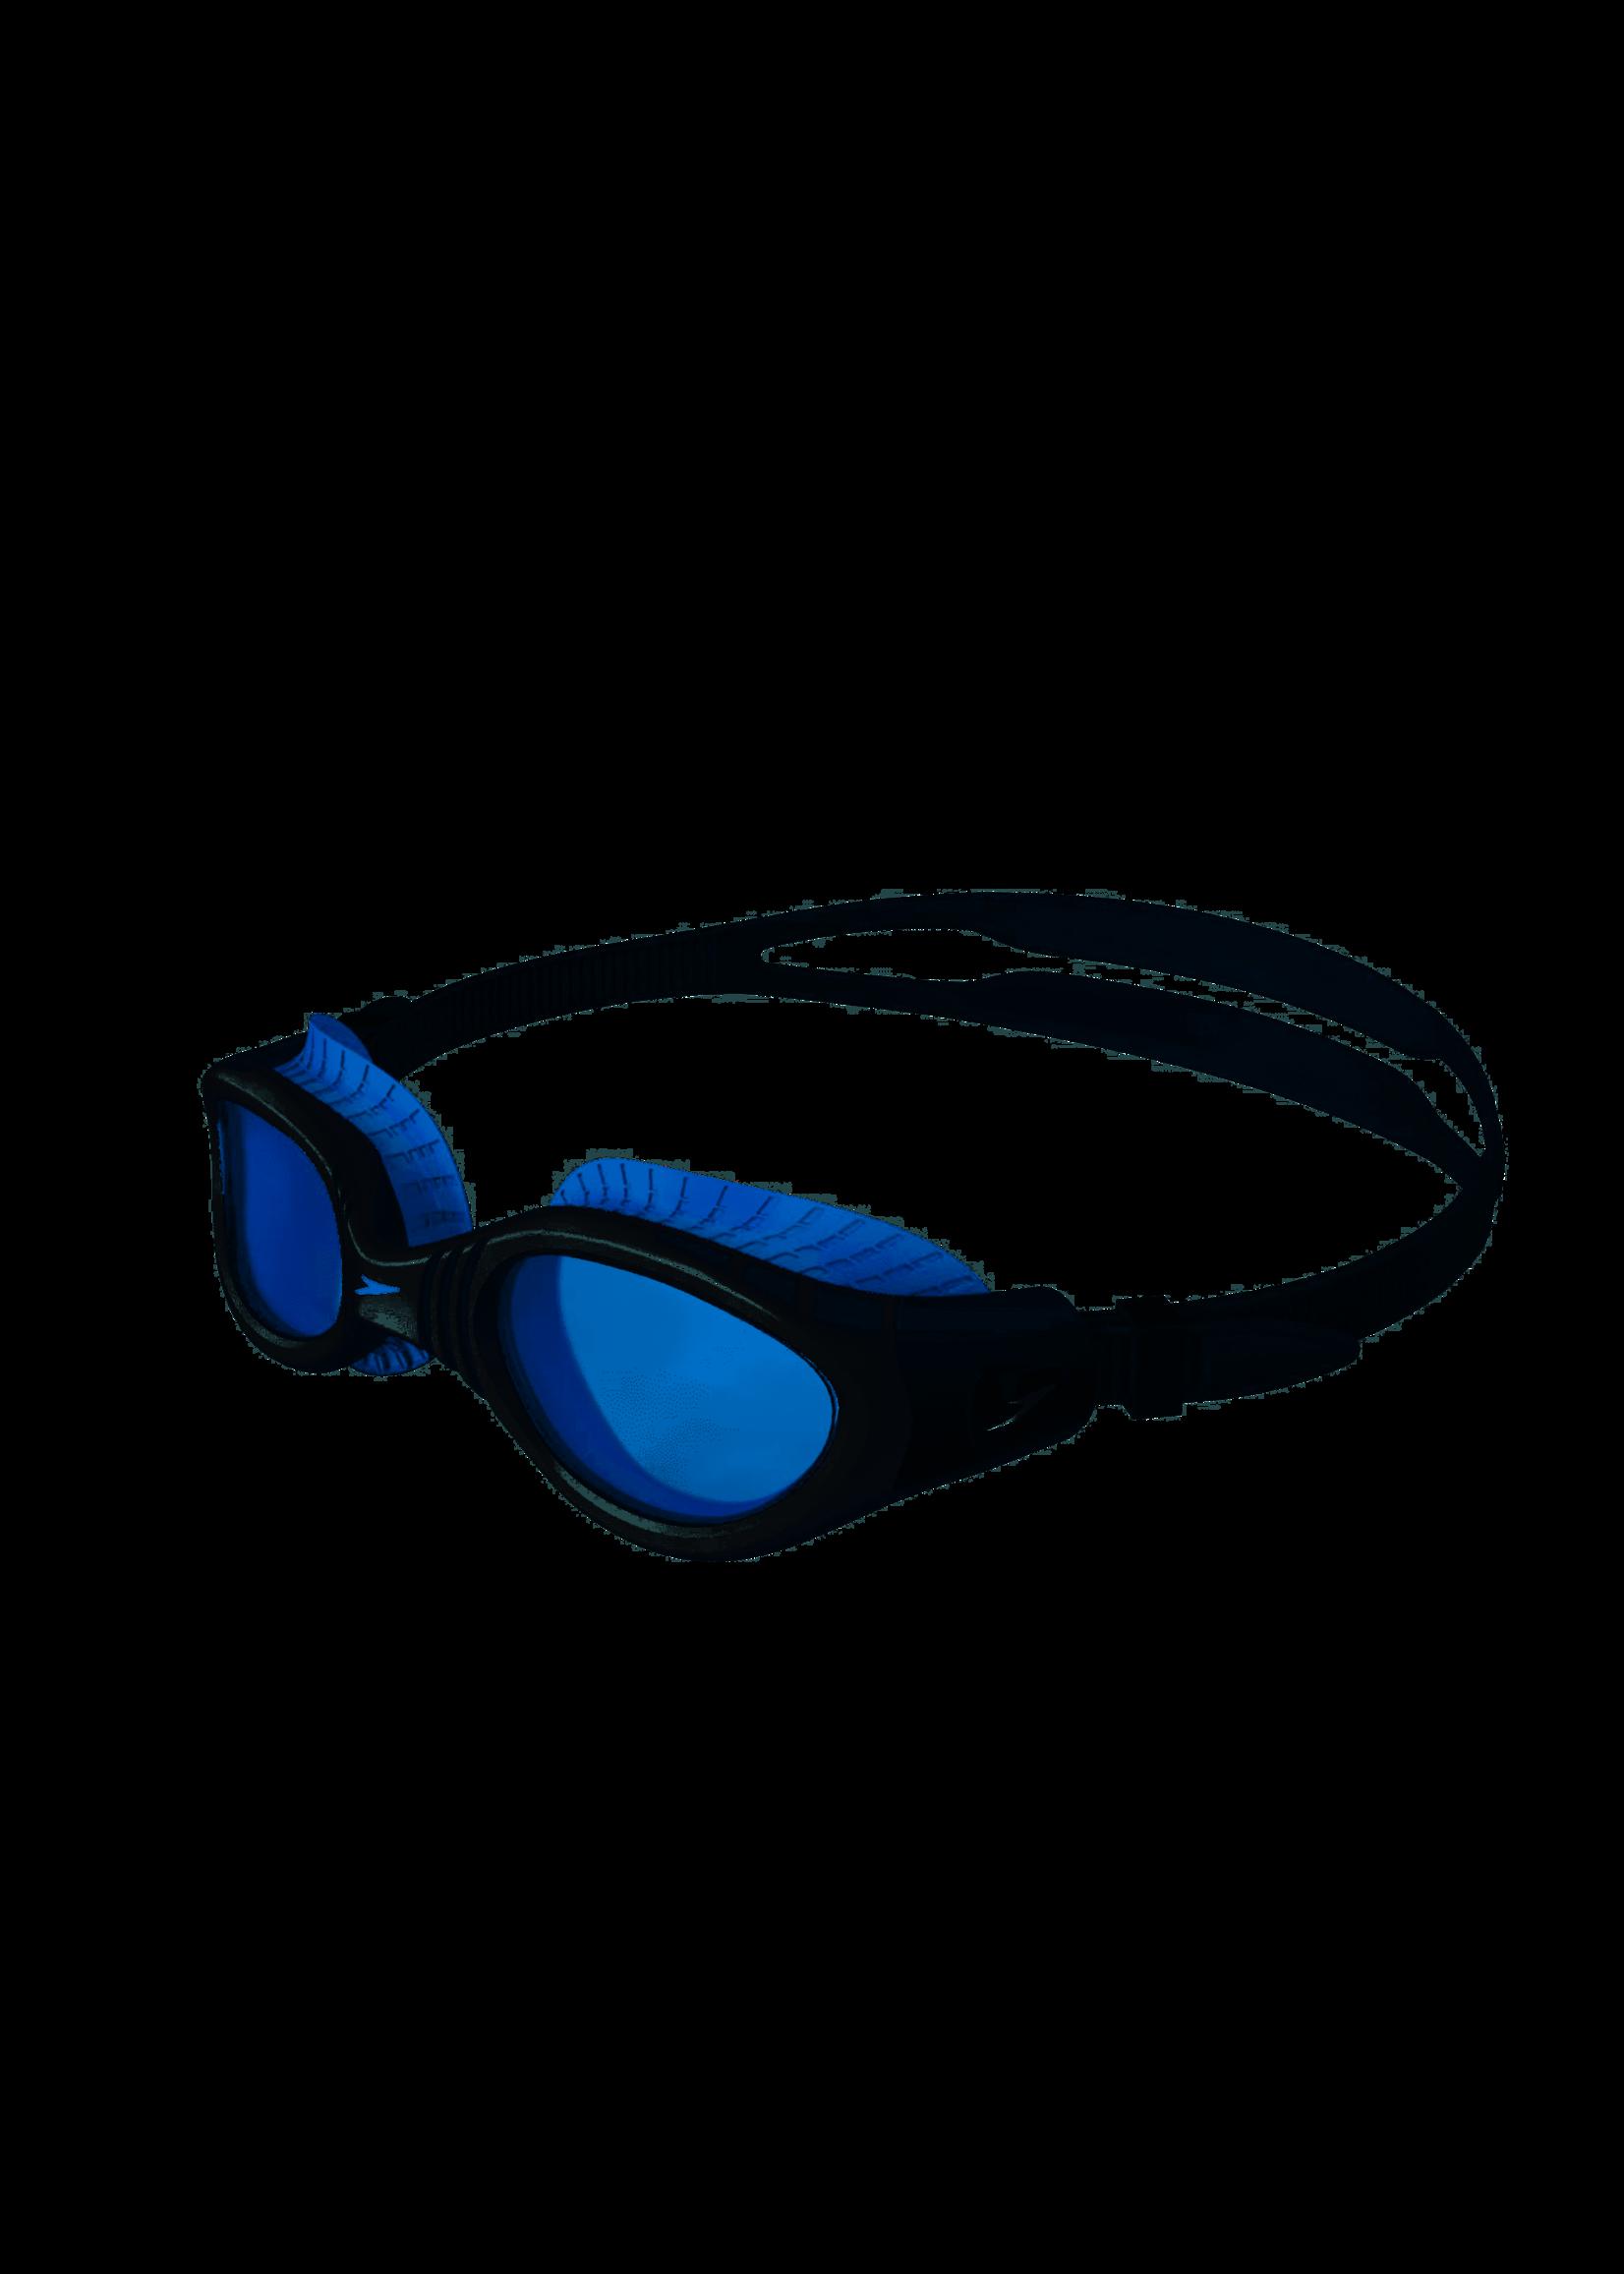 Speedo Speedo Adult Futura Biofuse Flexiseal, Blue/White